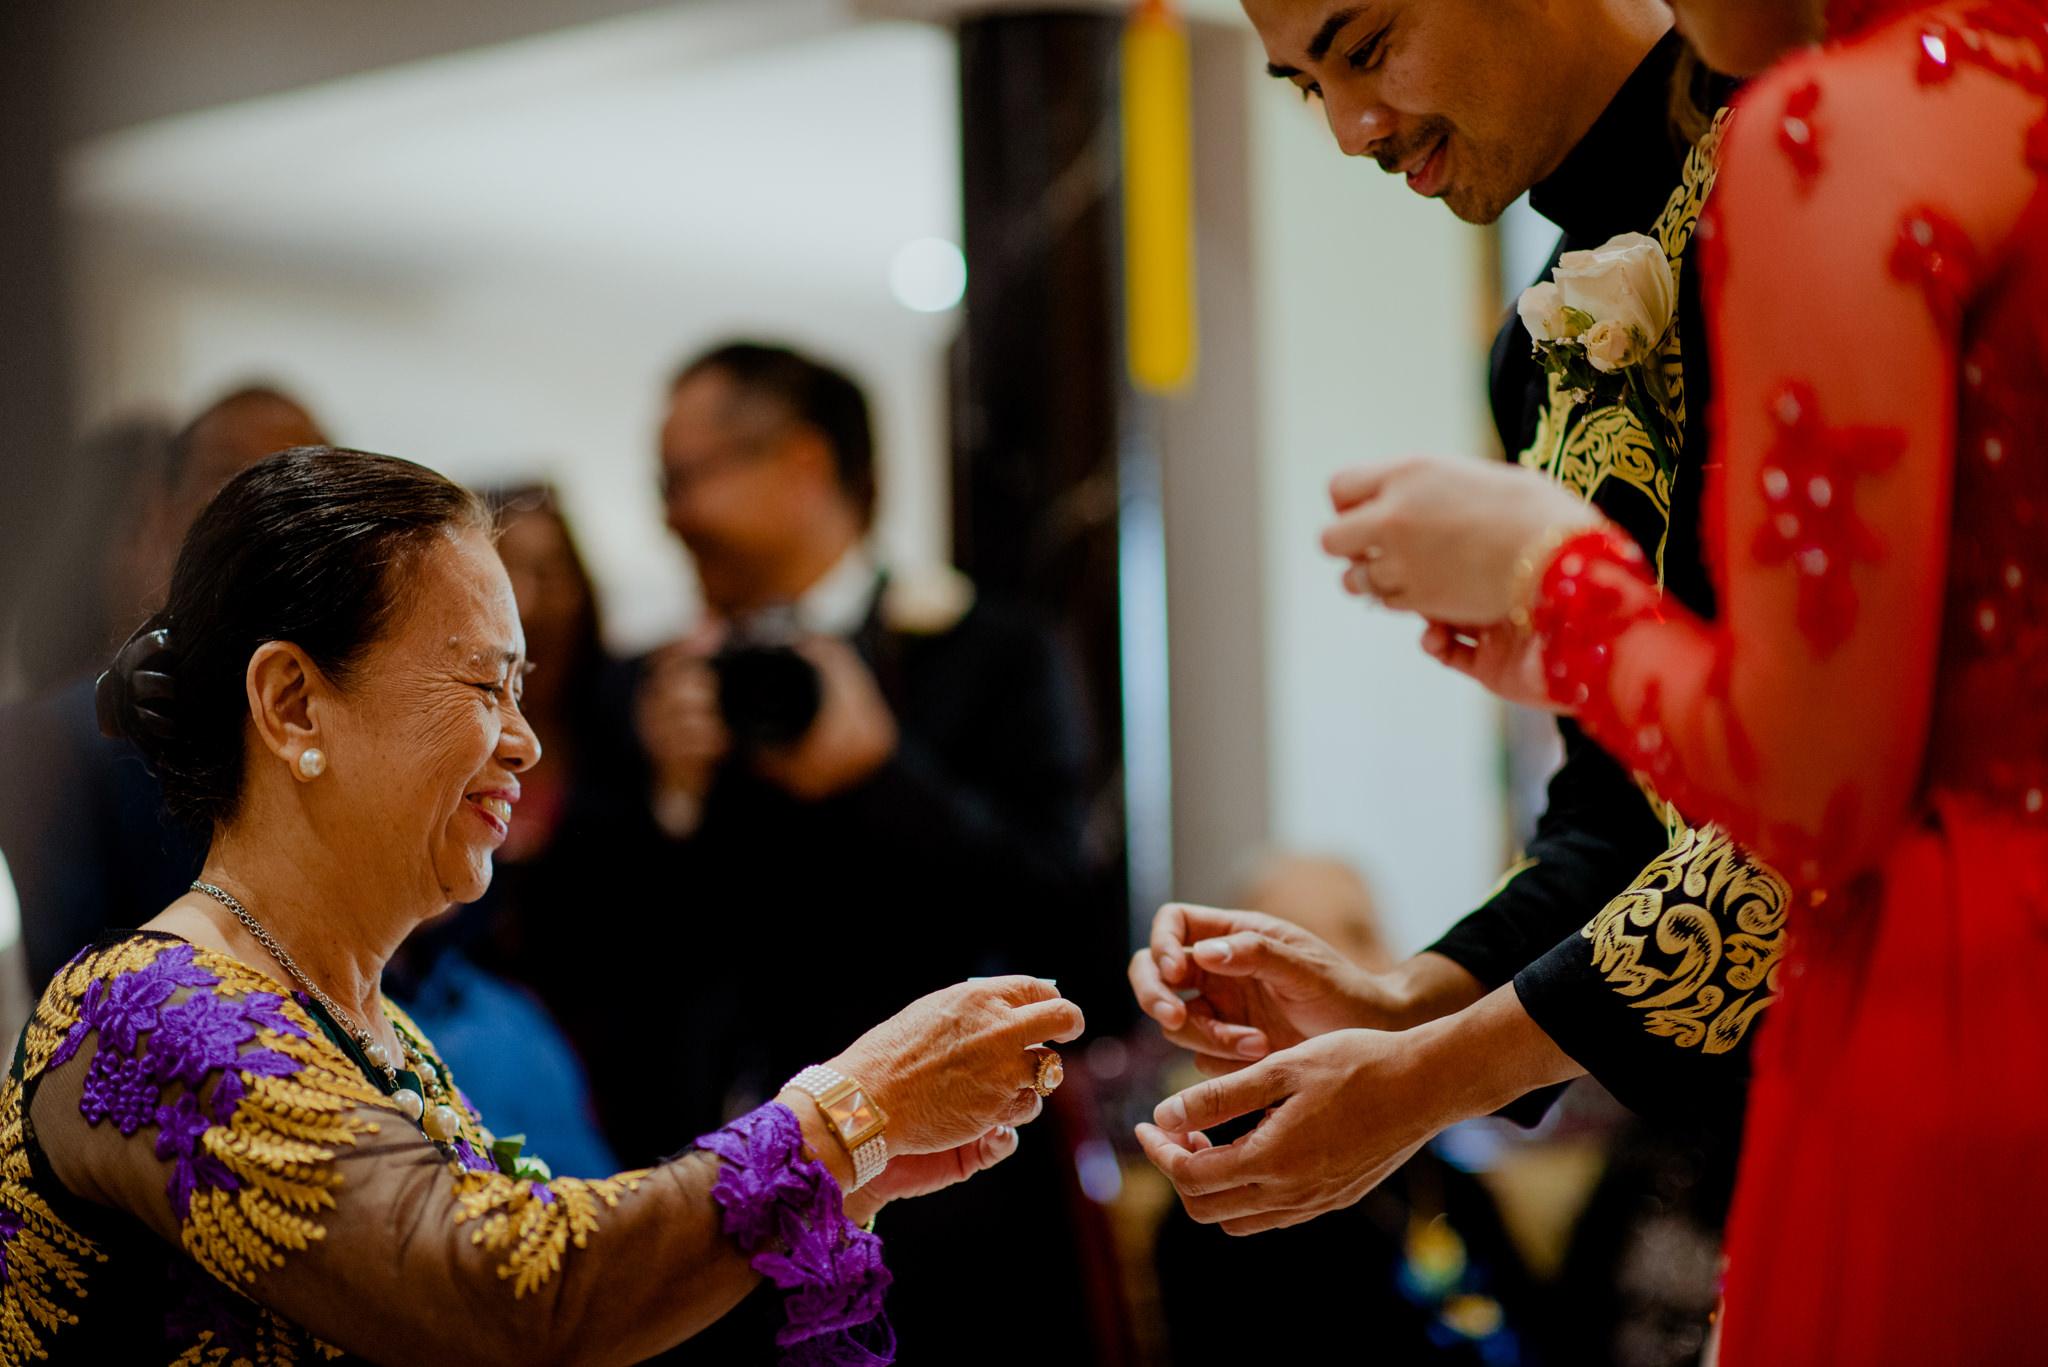 Man serves tea to an elderly woman during an Asian tea ceremony